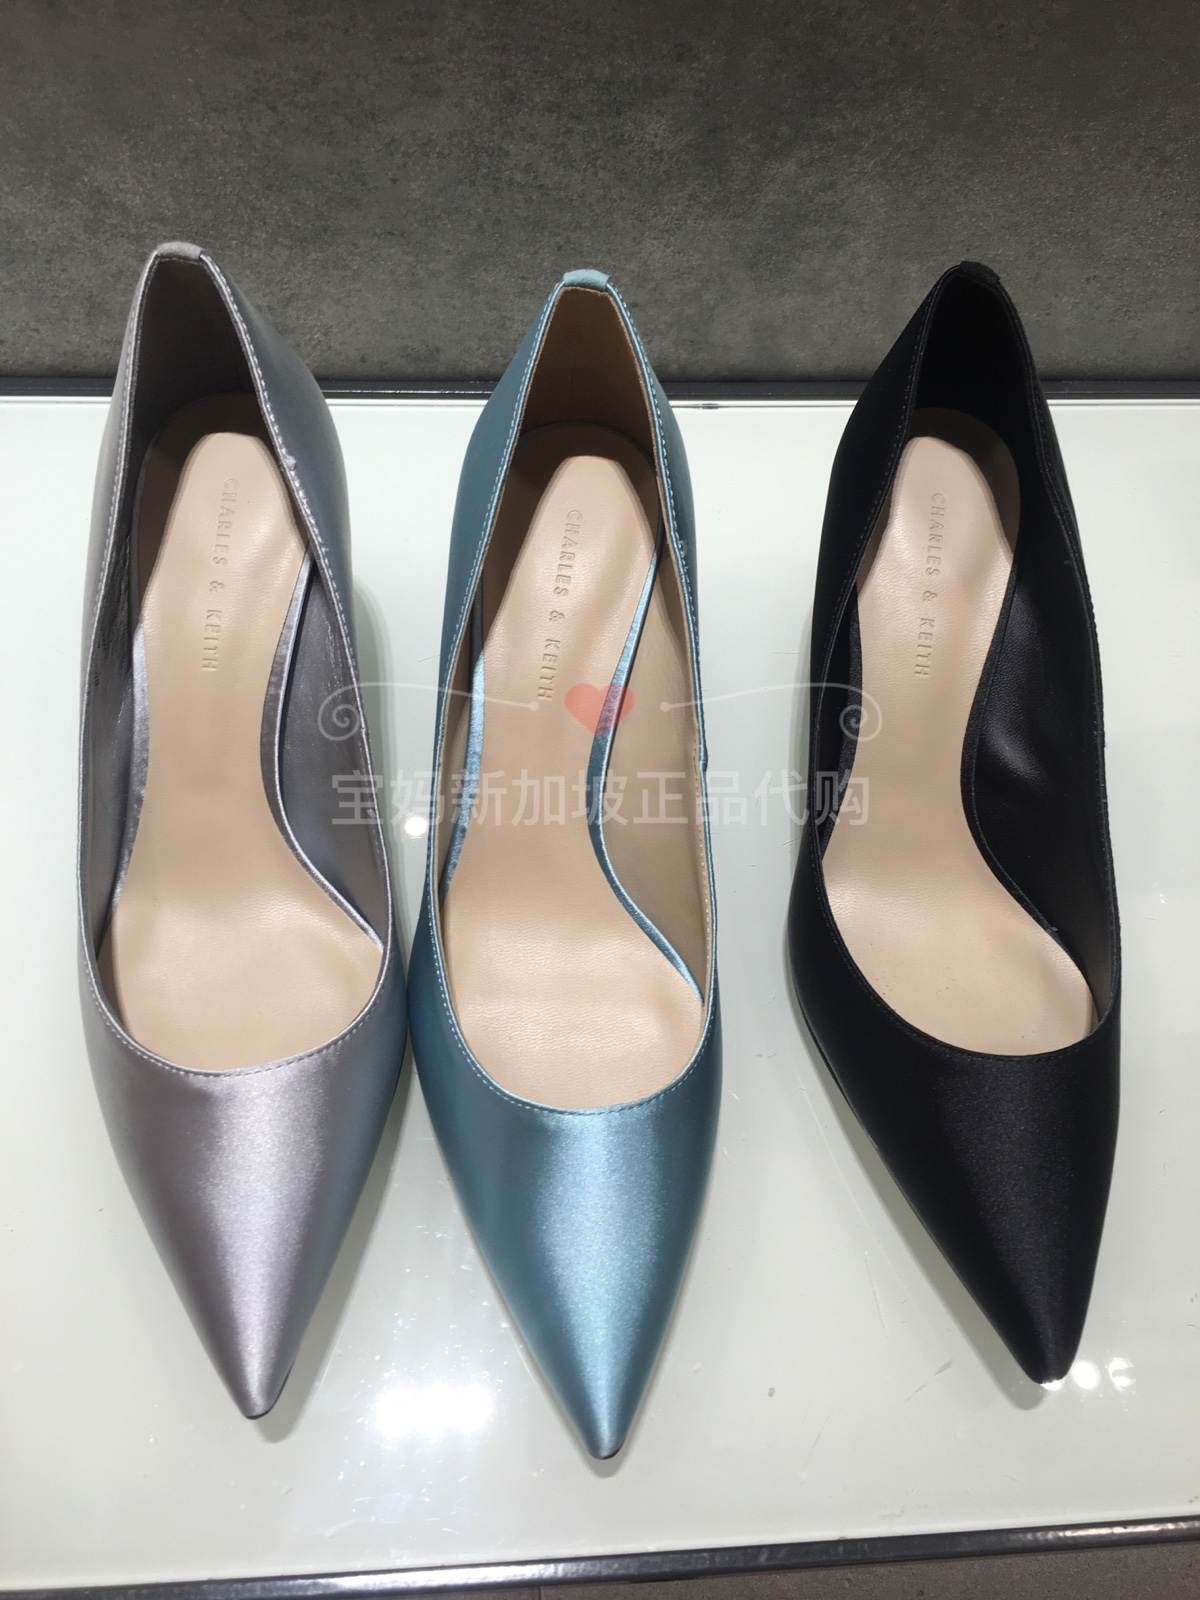 CHARLES&KEITH女士CK1-60361102半宝石通勤风格尖头高跟单鞋